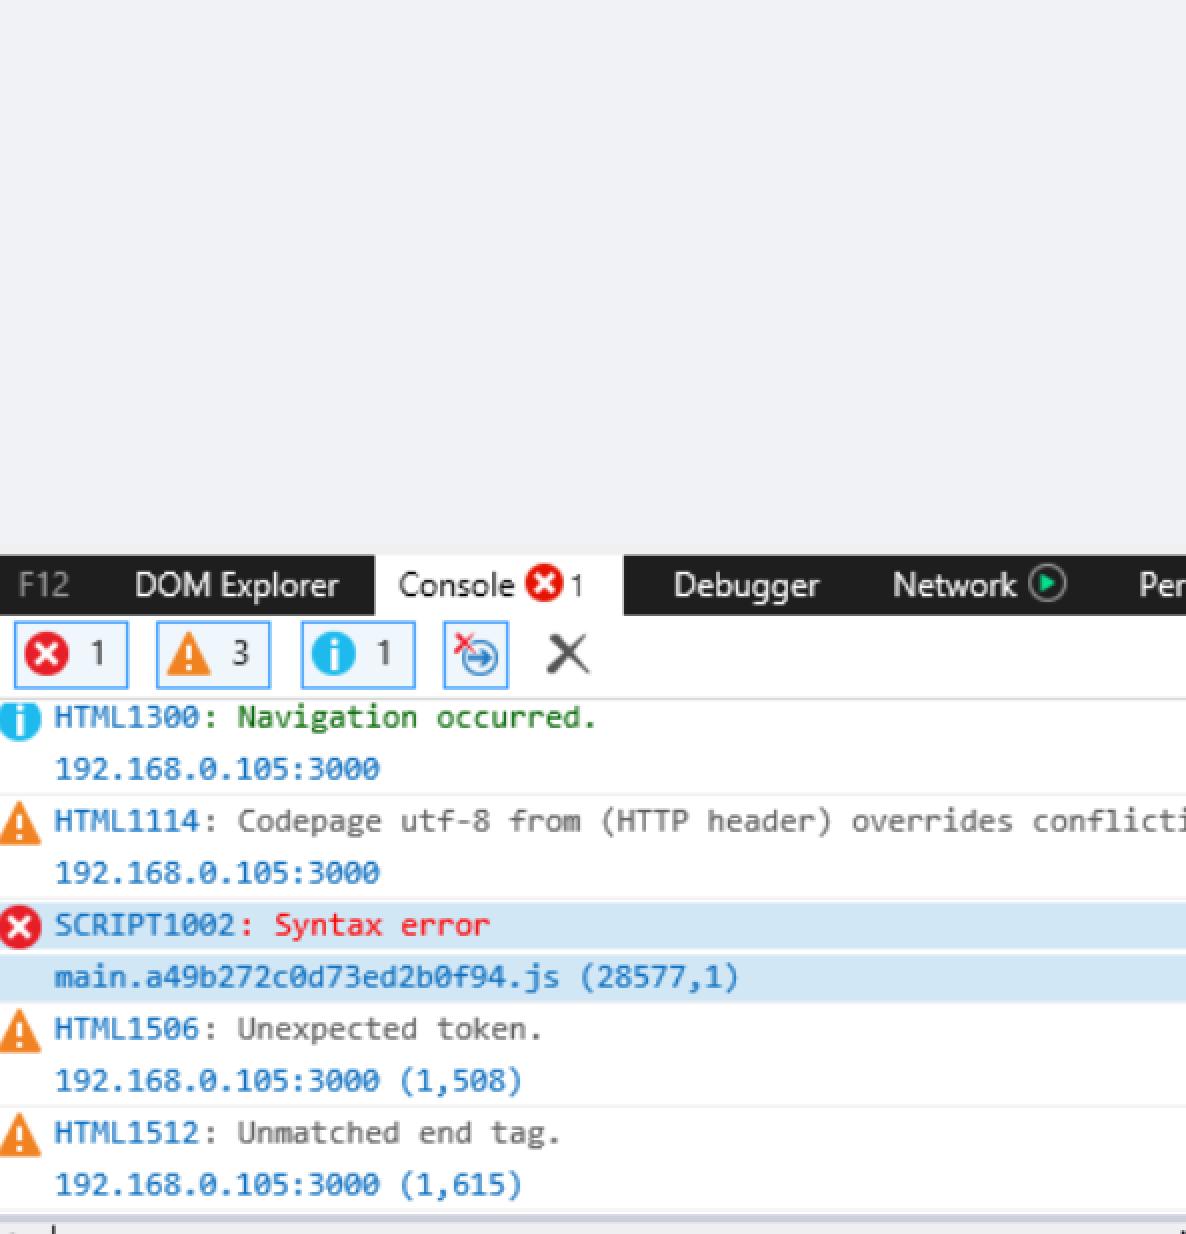 SCRIPT1002: Syntax error - IE11 · Issue #1433 · react-dnd/react-dnd